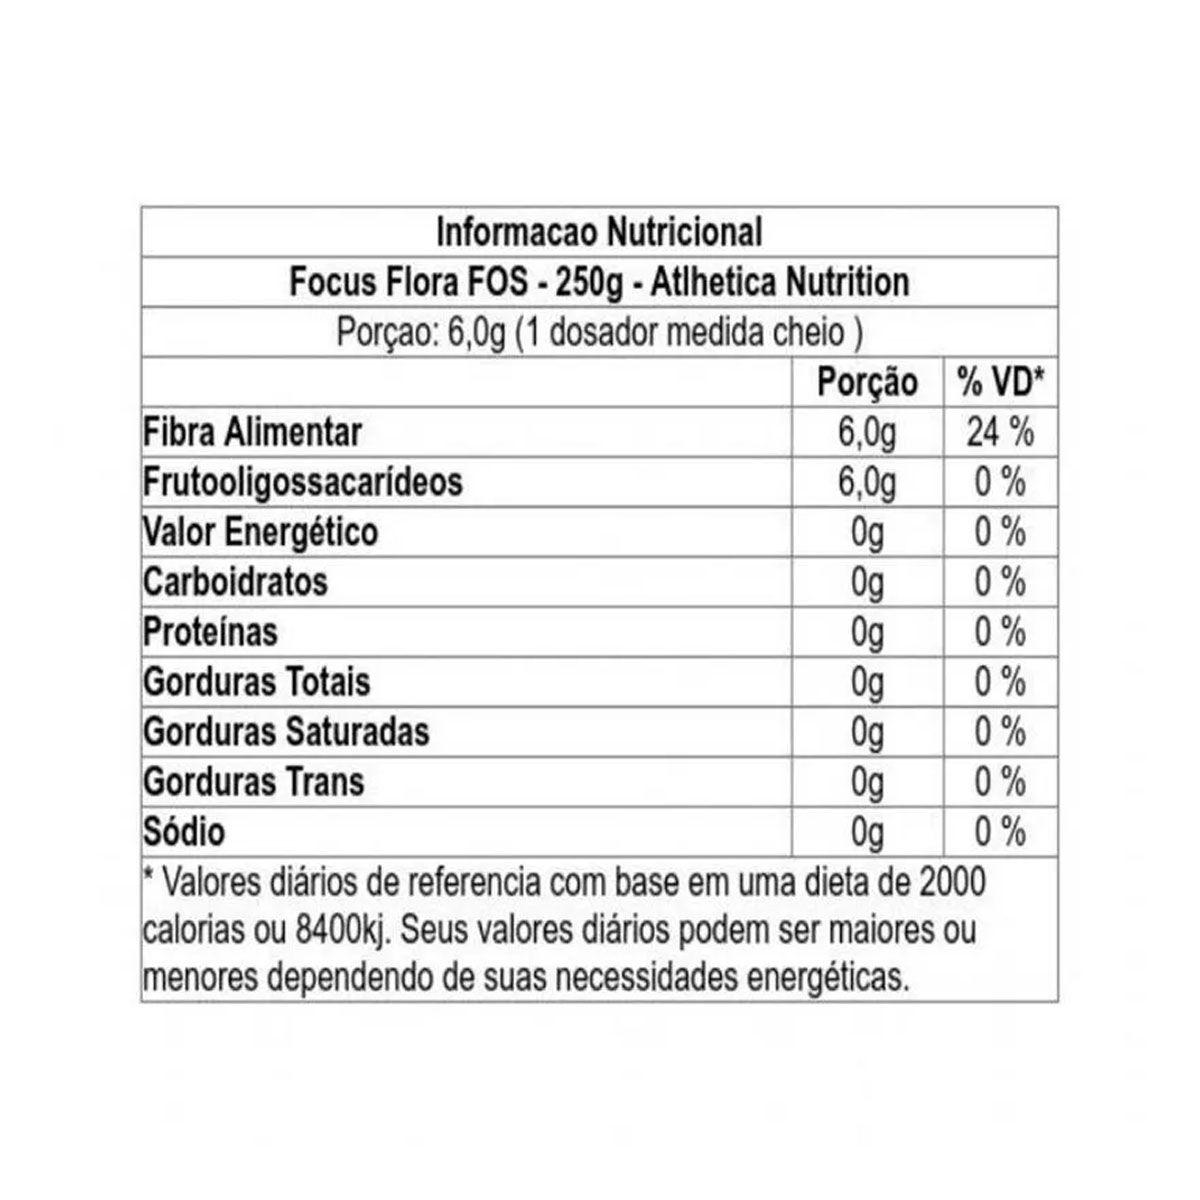 Focus Flora FOS 250g - Atlhetica Nutrition